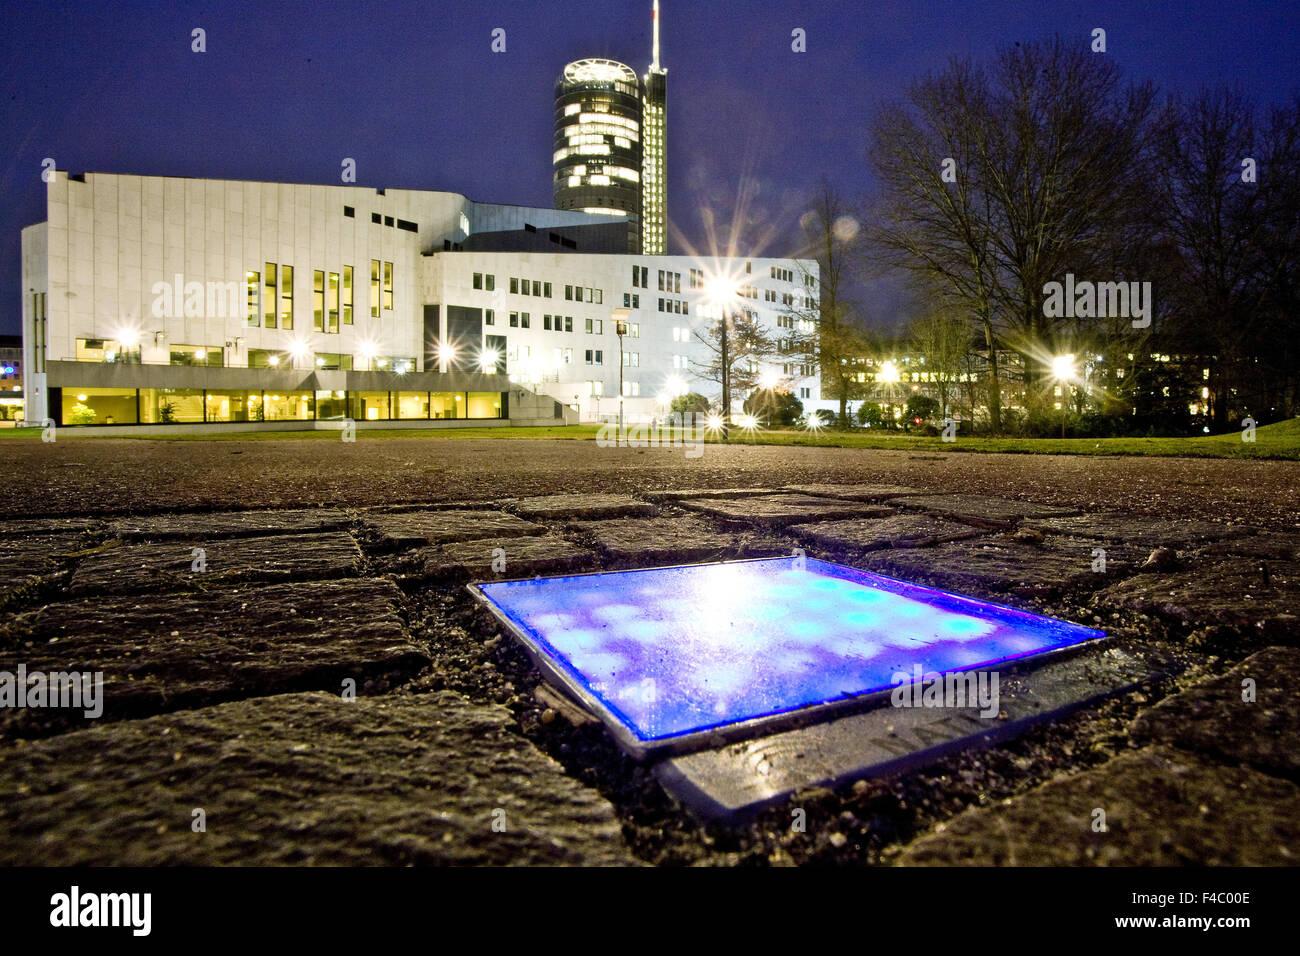 Kultur-Pfad, Essen, Deutschland Stockbild